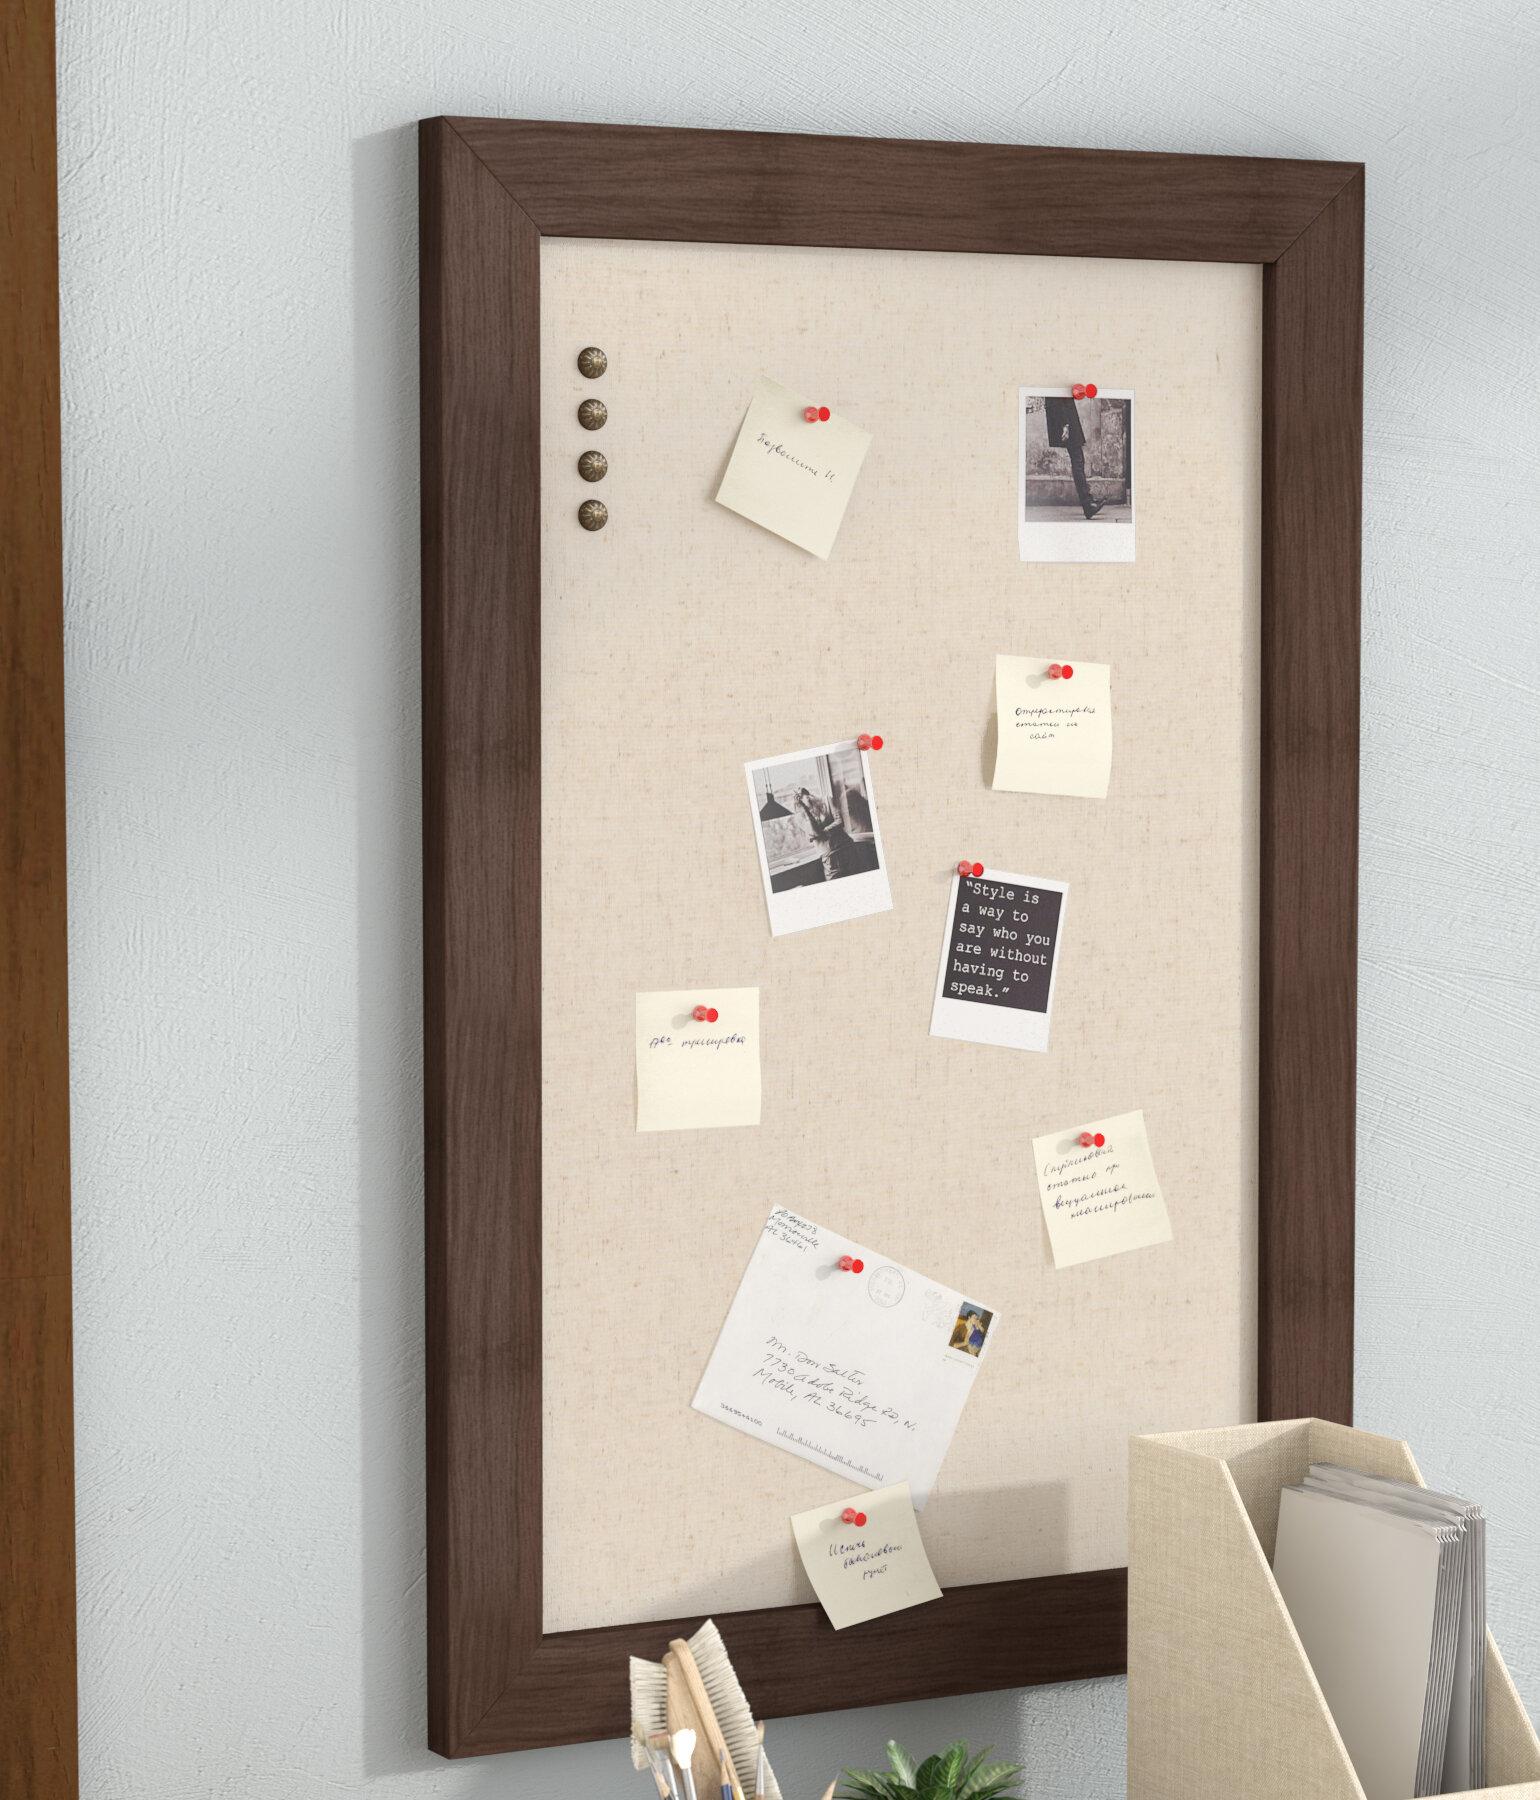 Union Rustic Framed Wall Mounted Bulletin Board & Reviews | Wayfair